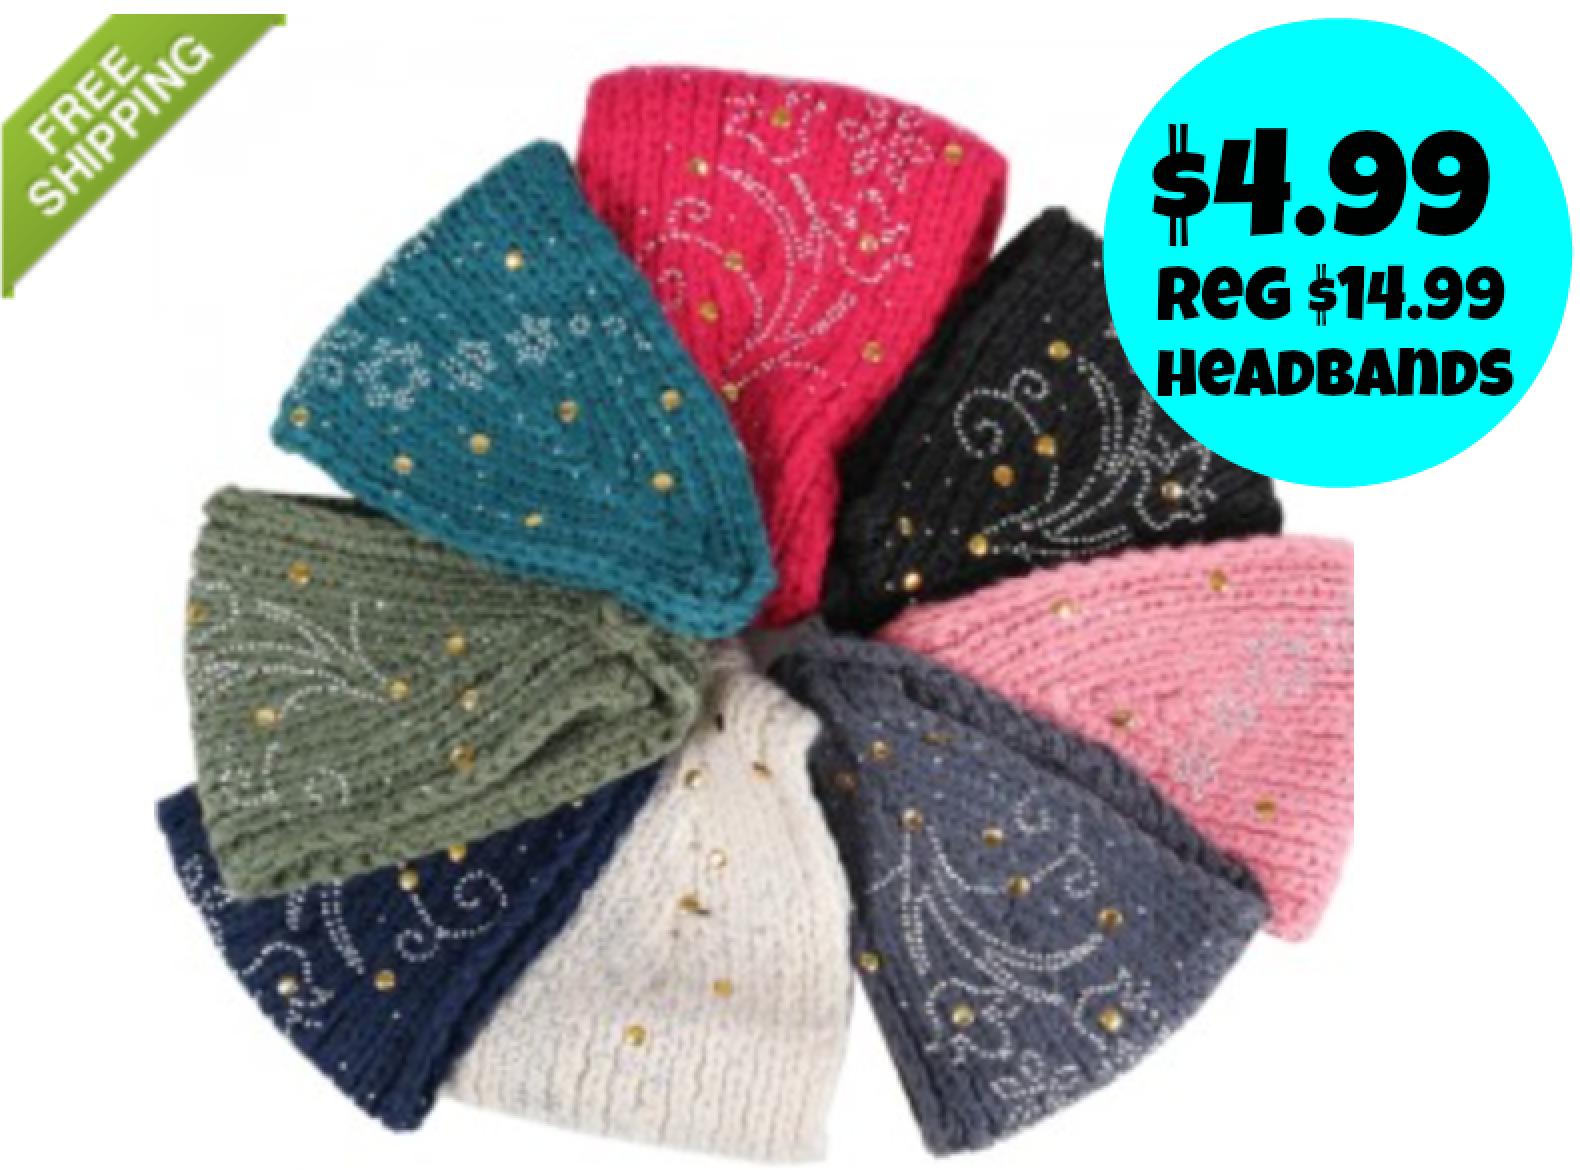 http://www.thebinderladies.com/2015/02/gearxs-rhinestone-crocheted-headbands.html#.VNqq9ofduyM